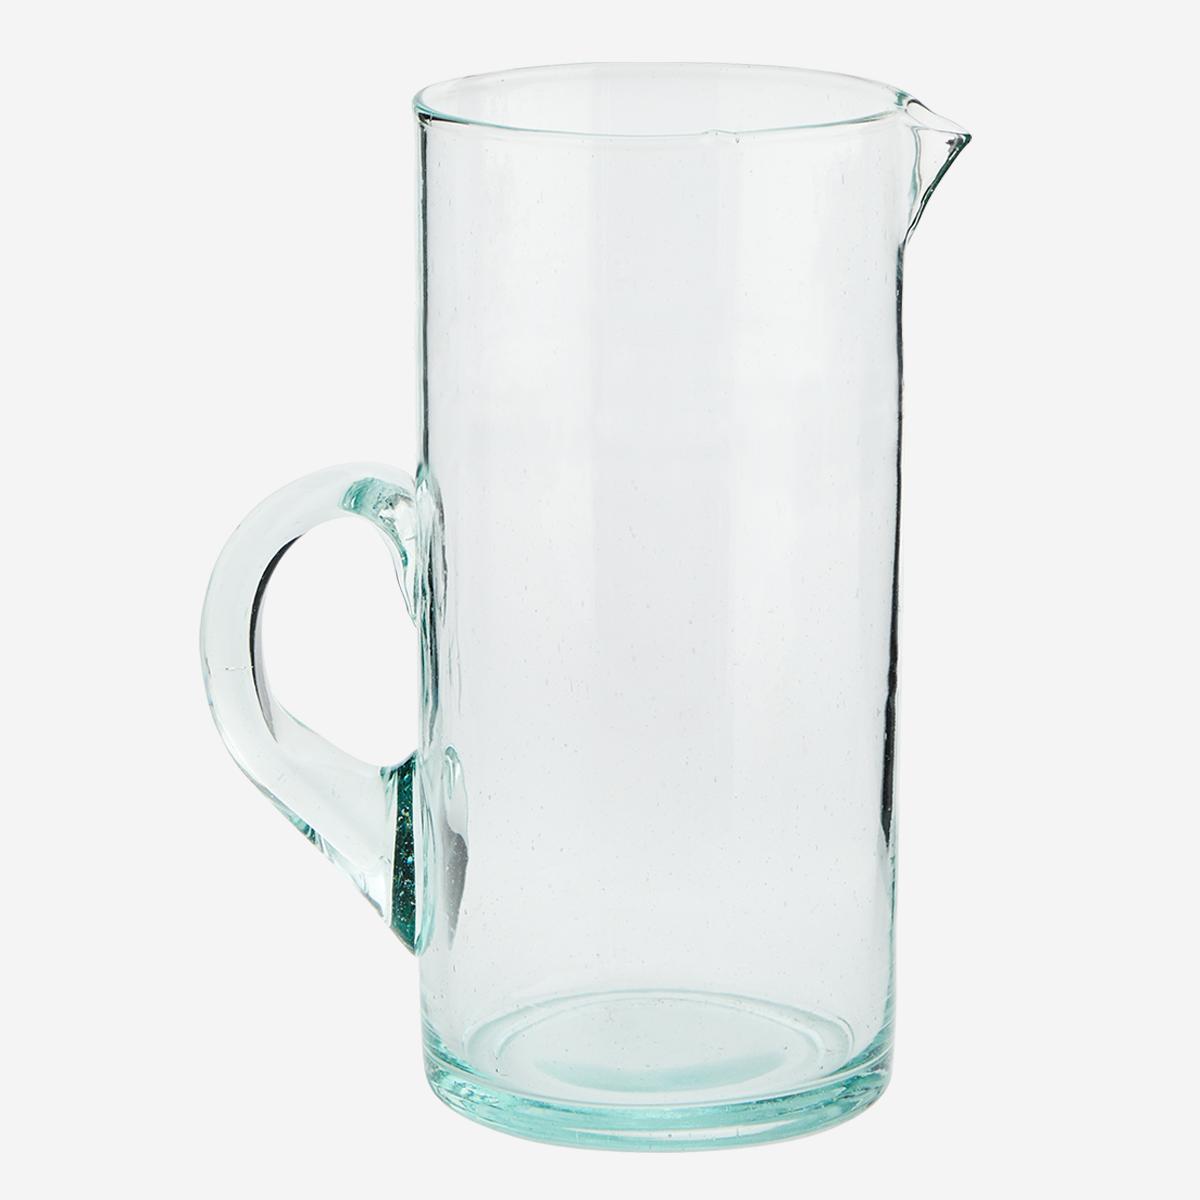 Cruche Beldi en verre * Madam Stoltz